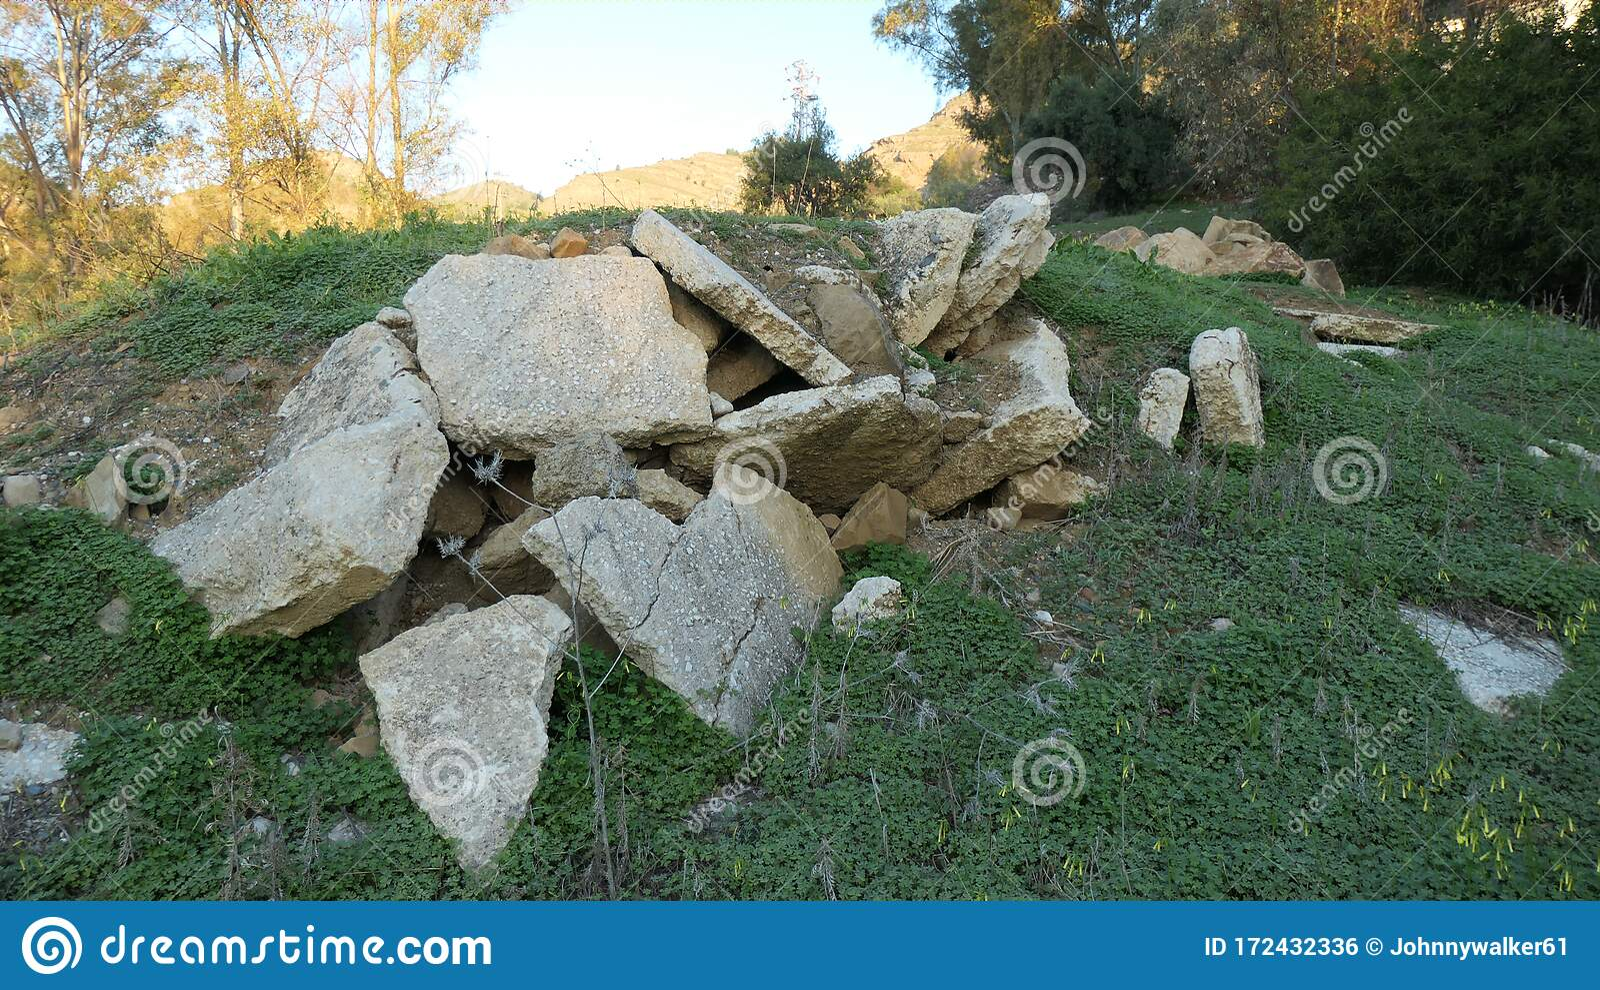 Concrete Slab Hillock Stock Photo Image Of Construction 172432336